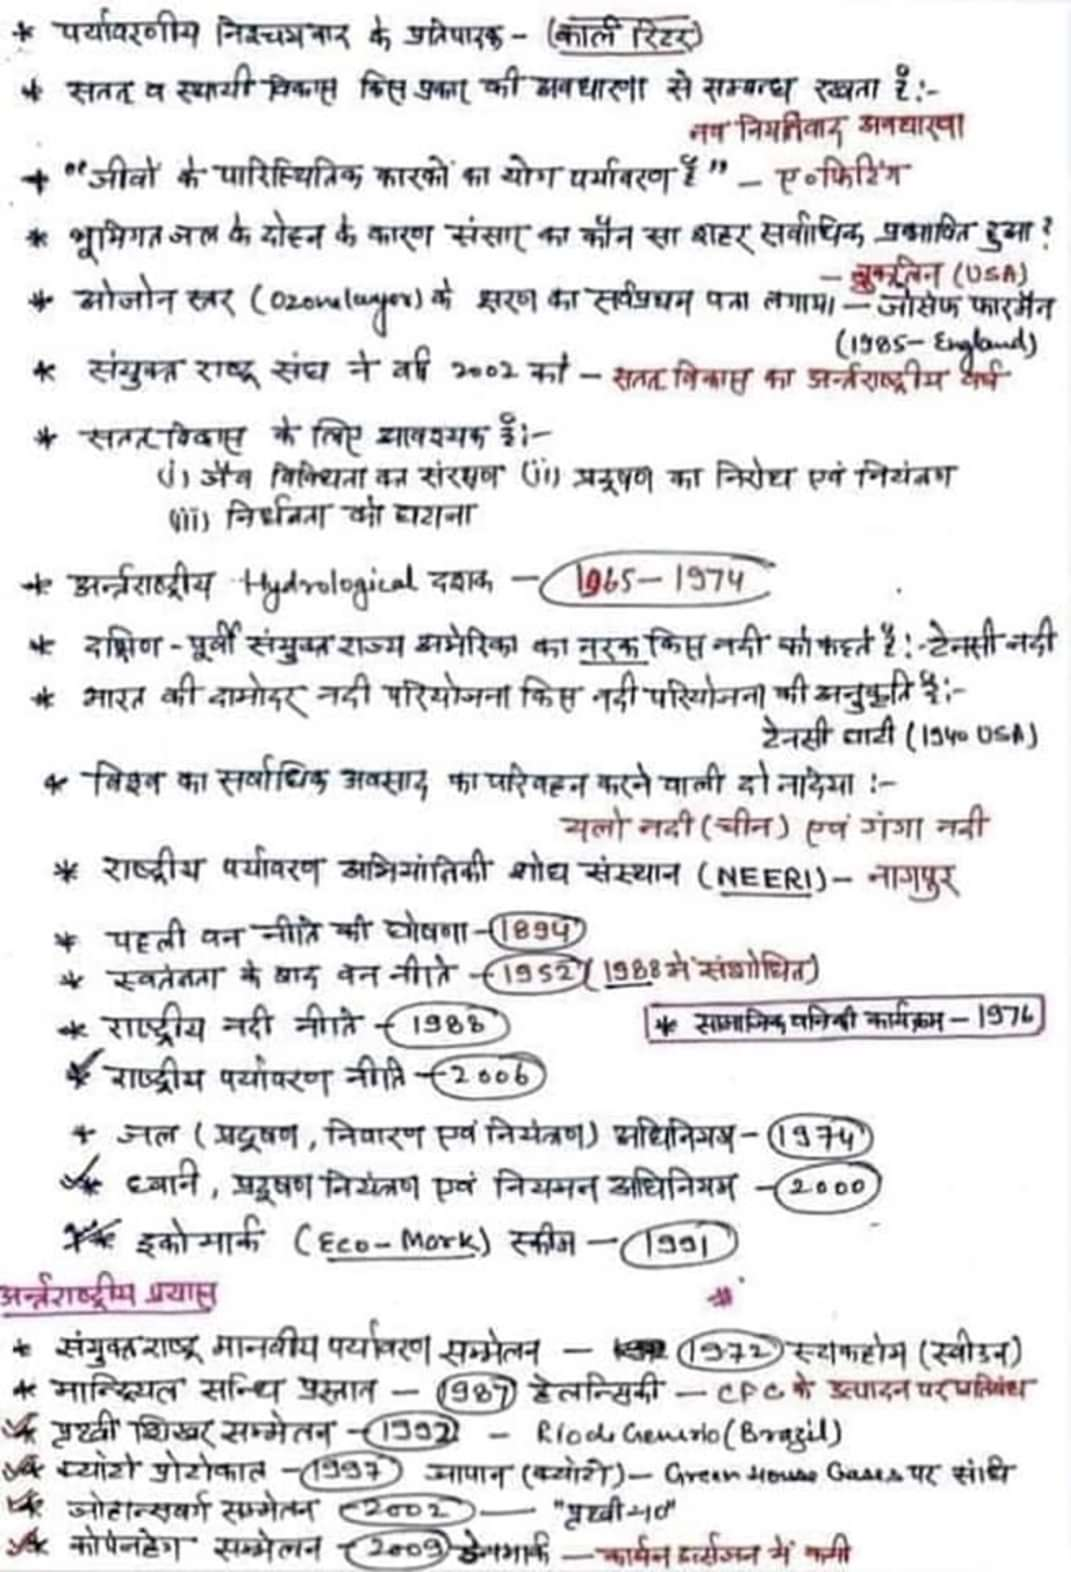 Up Teacher bharti notes  up supertet notes evs notes supertet notes download pdf सुपरटेट नोट्स